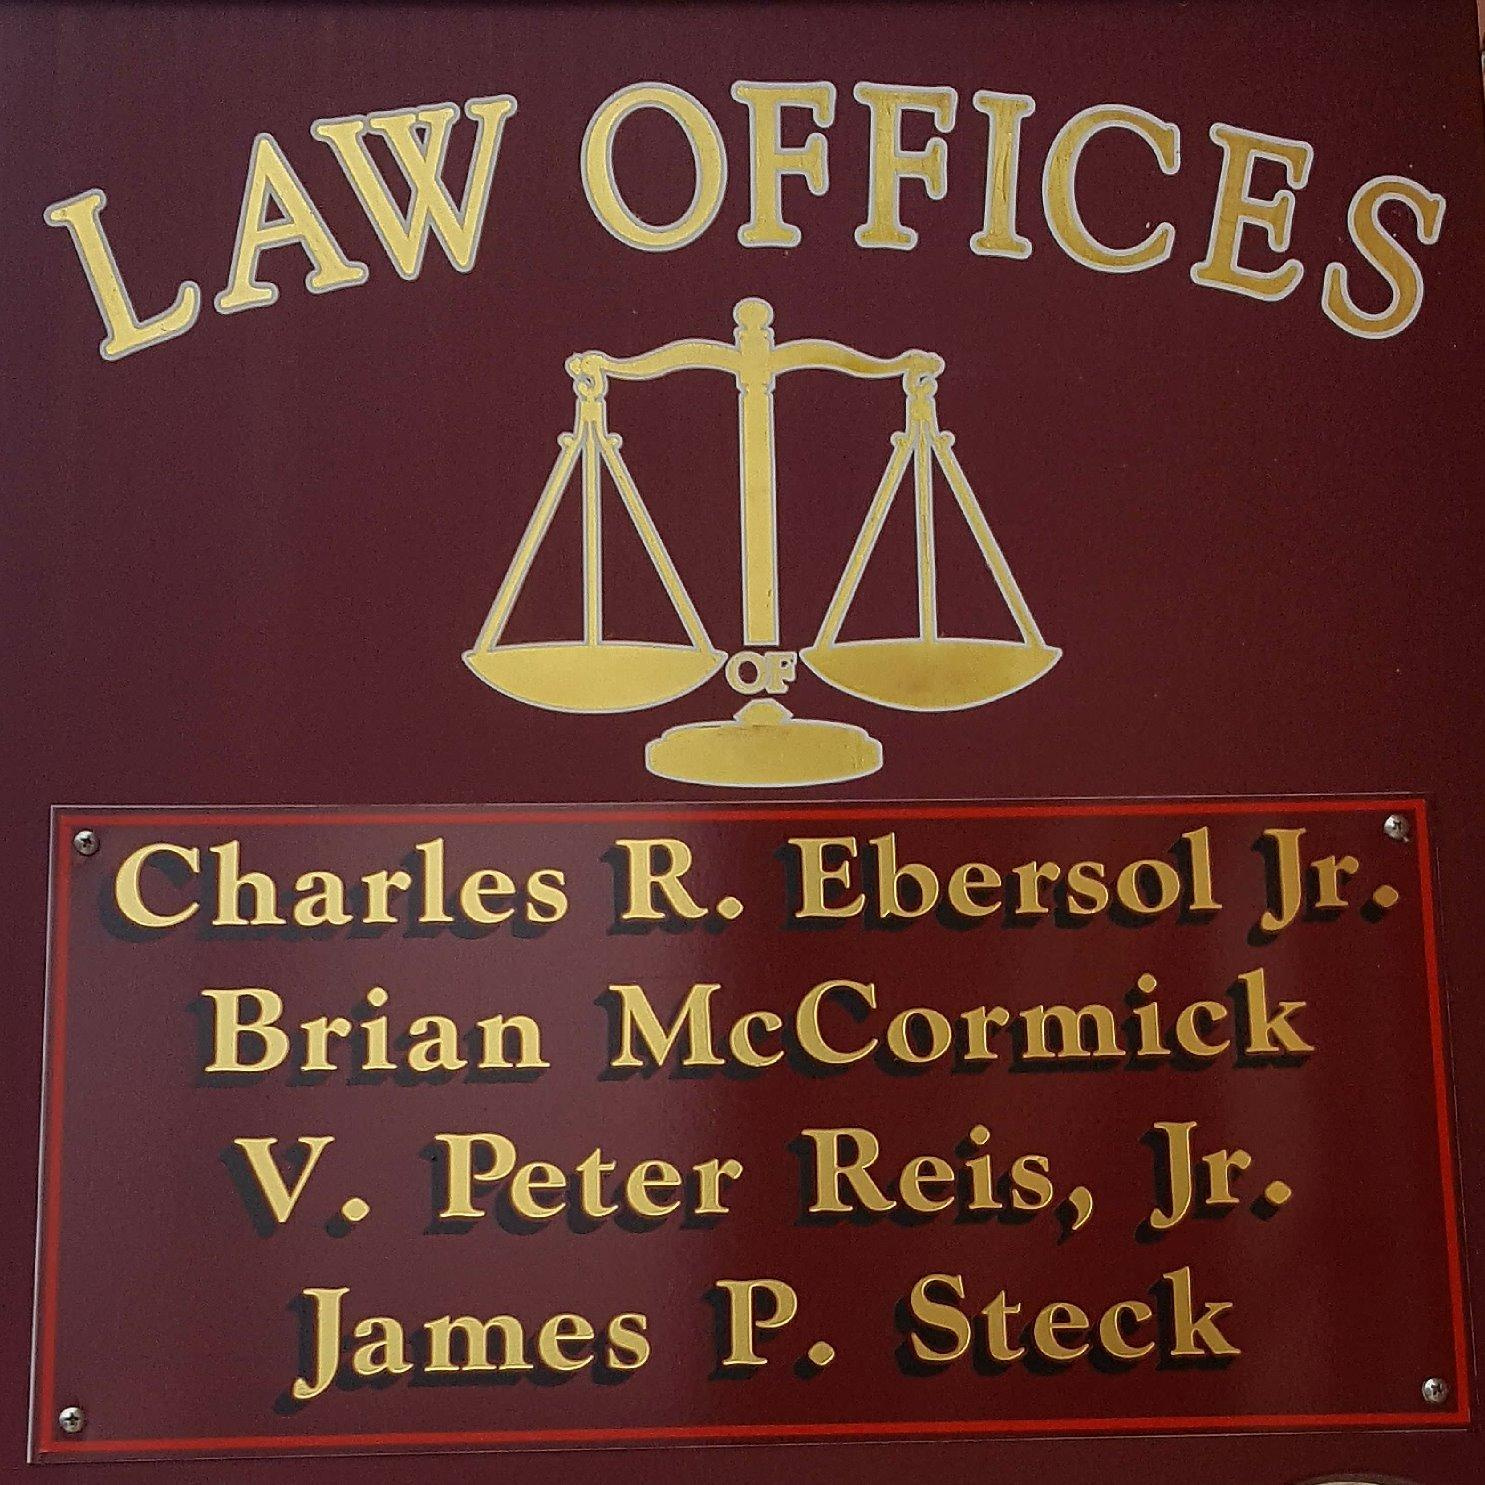 Ebersol, McCormick, Reis & Steck, LLC